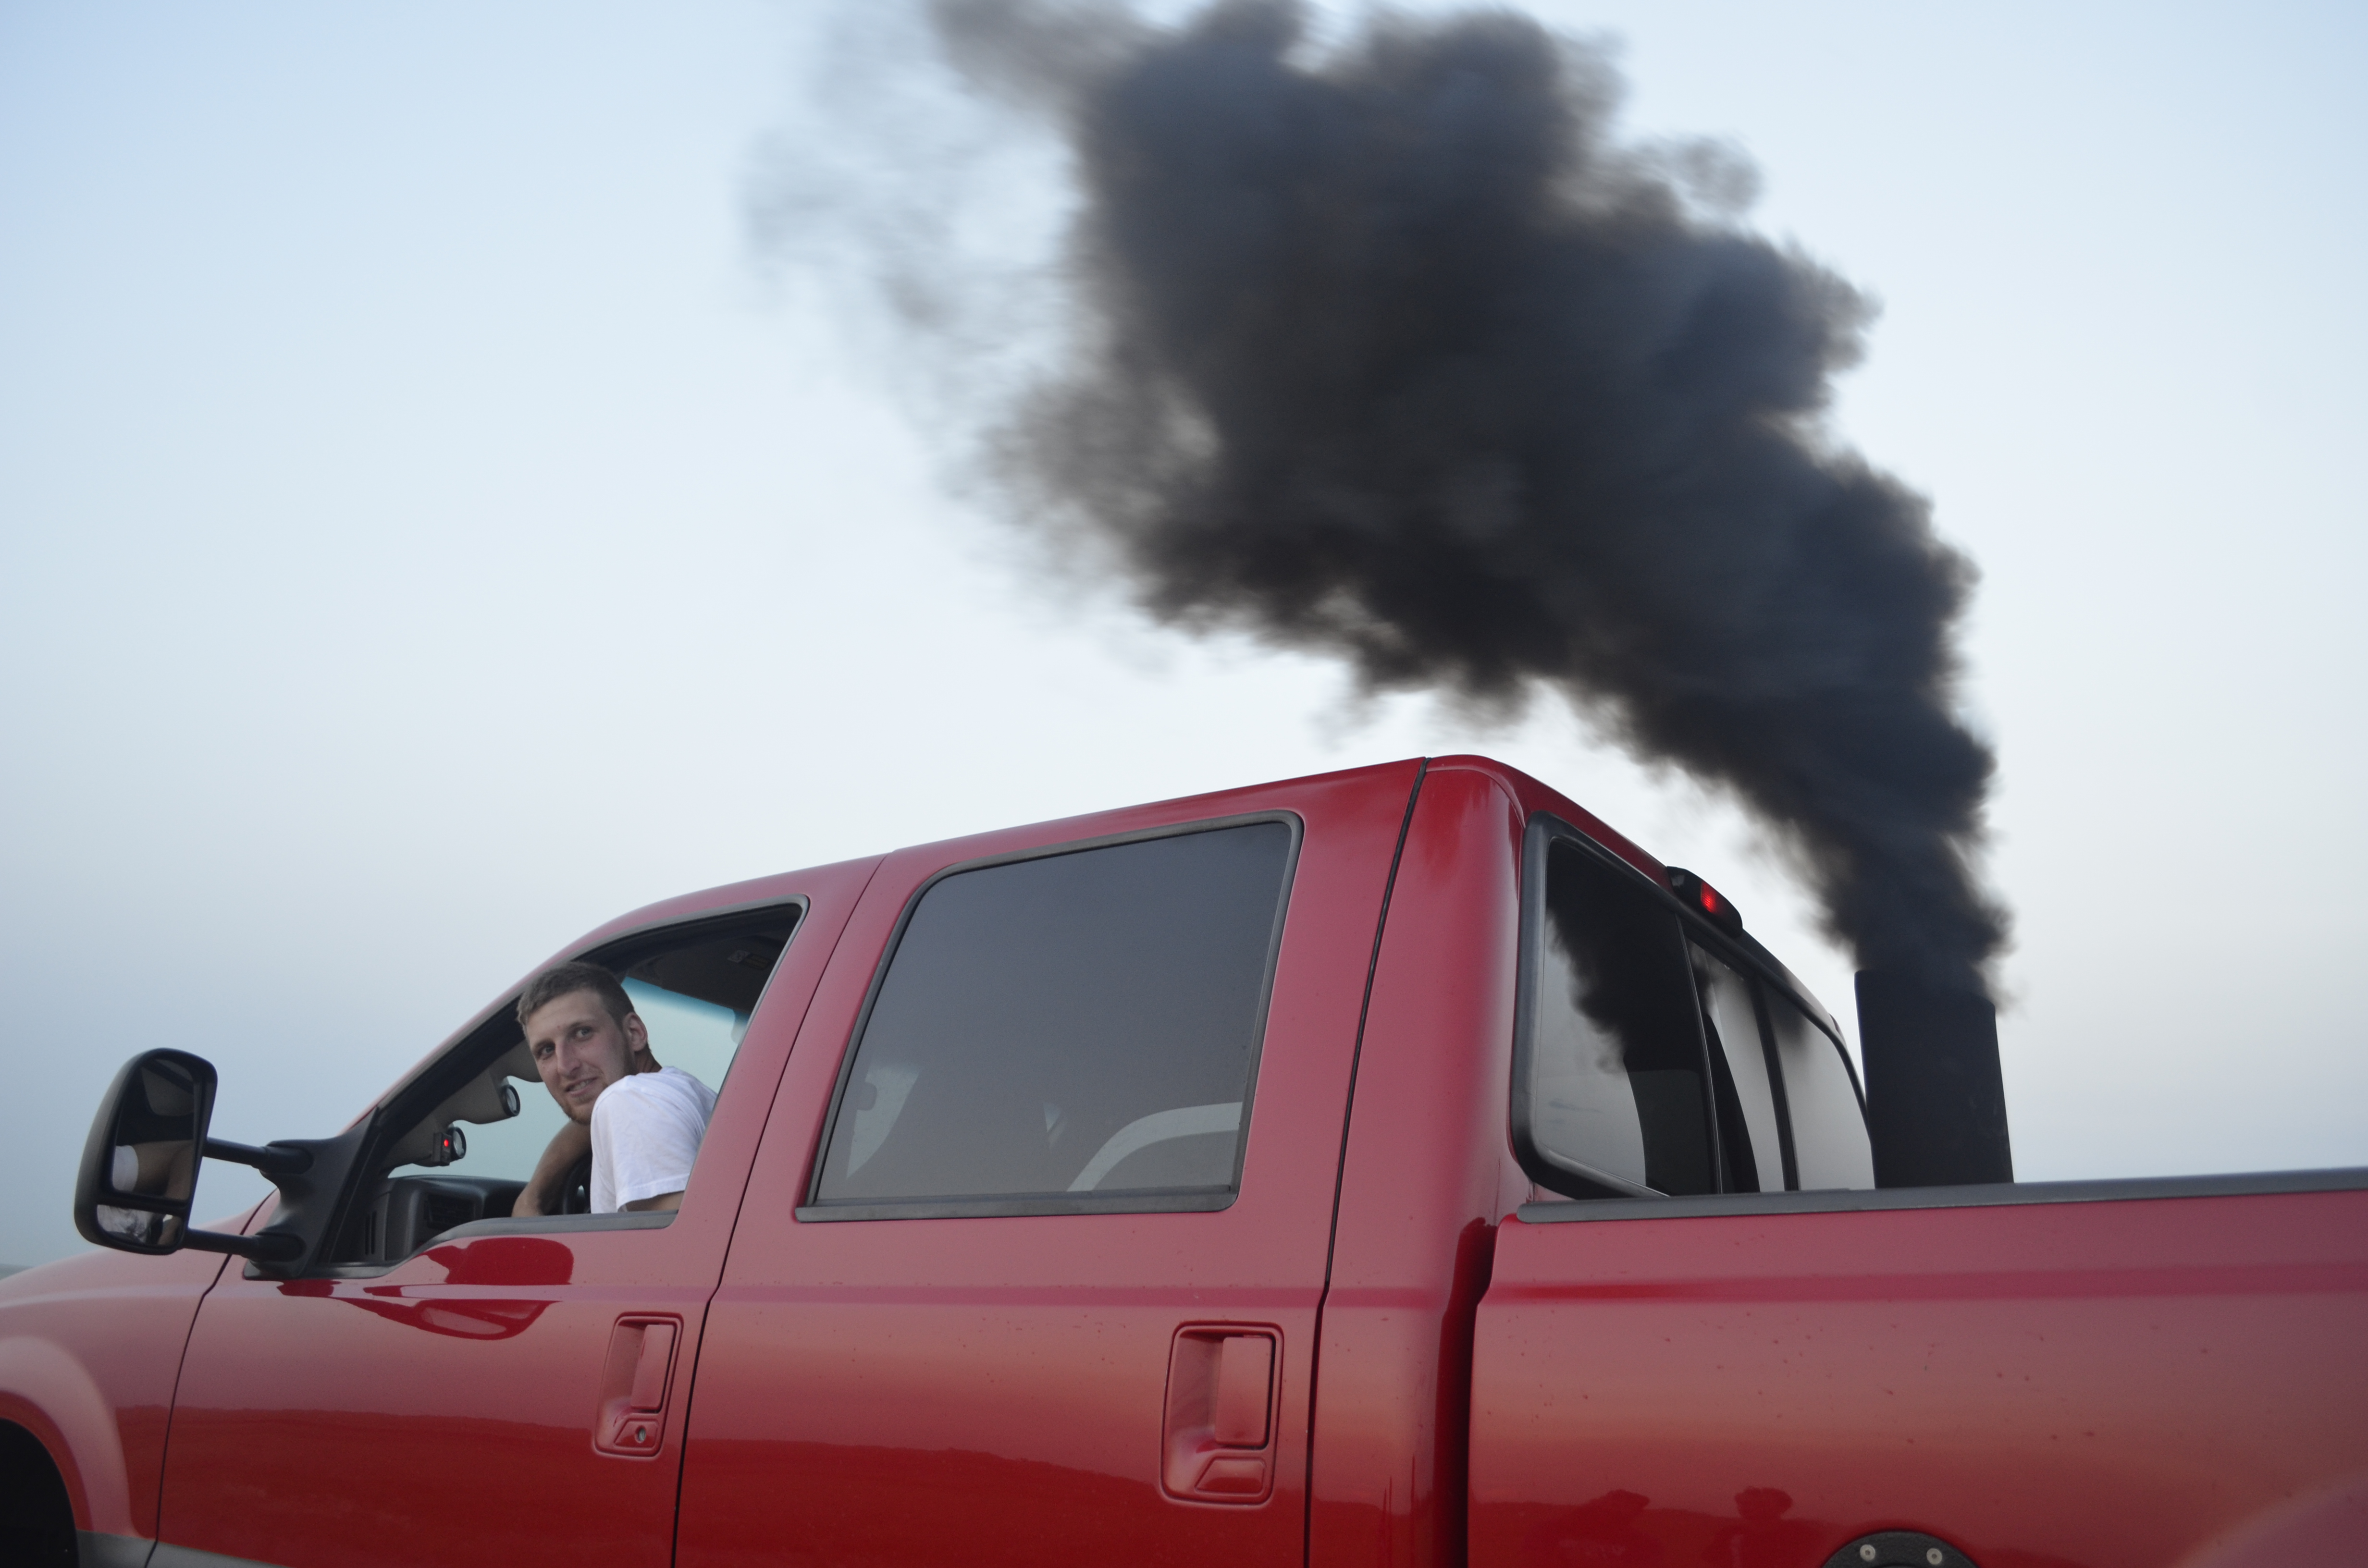 Caption: Calvin Fields rollin' coal in Williston, North Dakota., Credit: Todd Melby